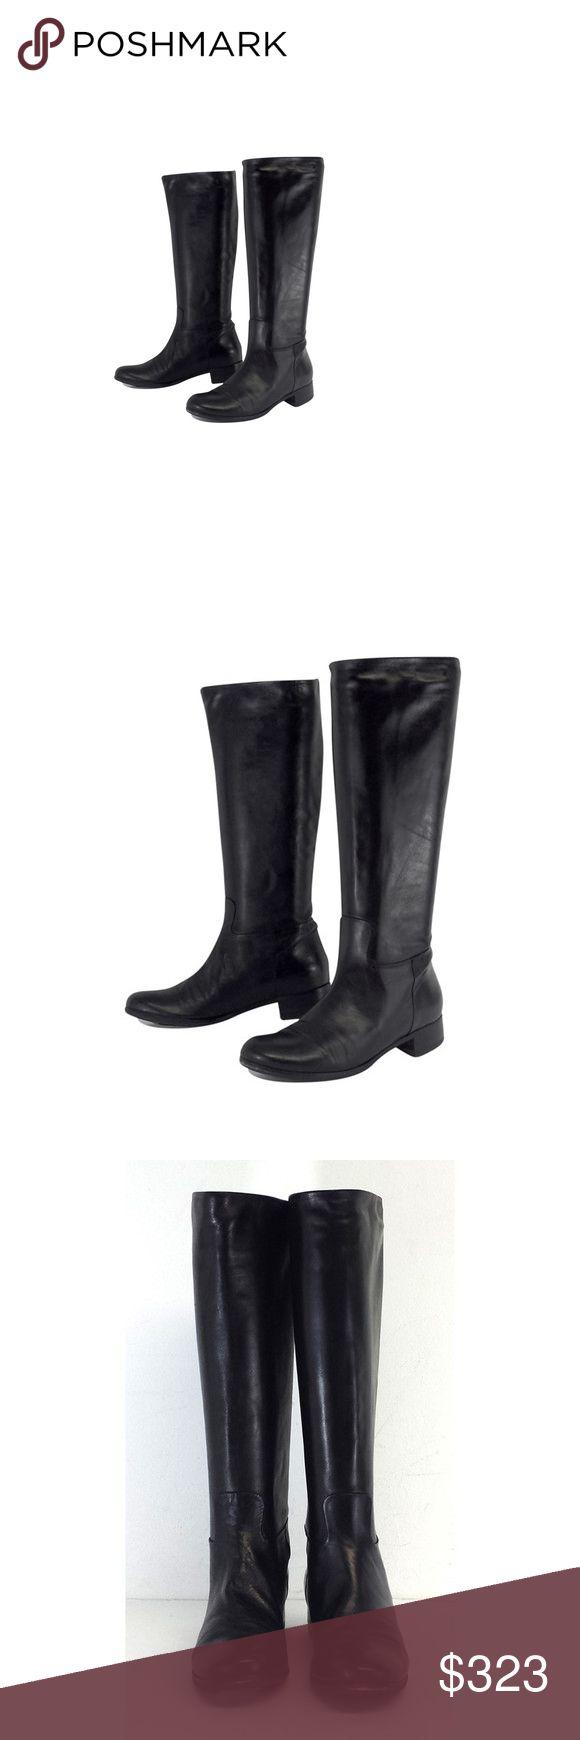 Roberto Del Carlo- Black Leather Knee High Boots Sz 7.5 Roberto Del Carlo- Black Leather Knee High Boots Sz 7.5 Roberto Del Carlo Shoes High Low